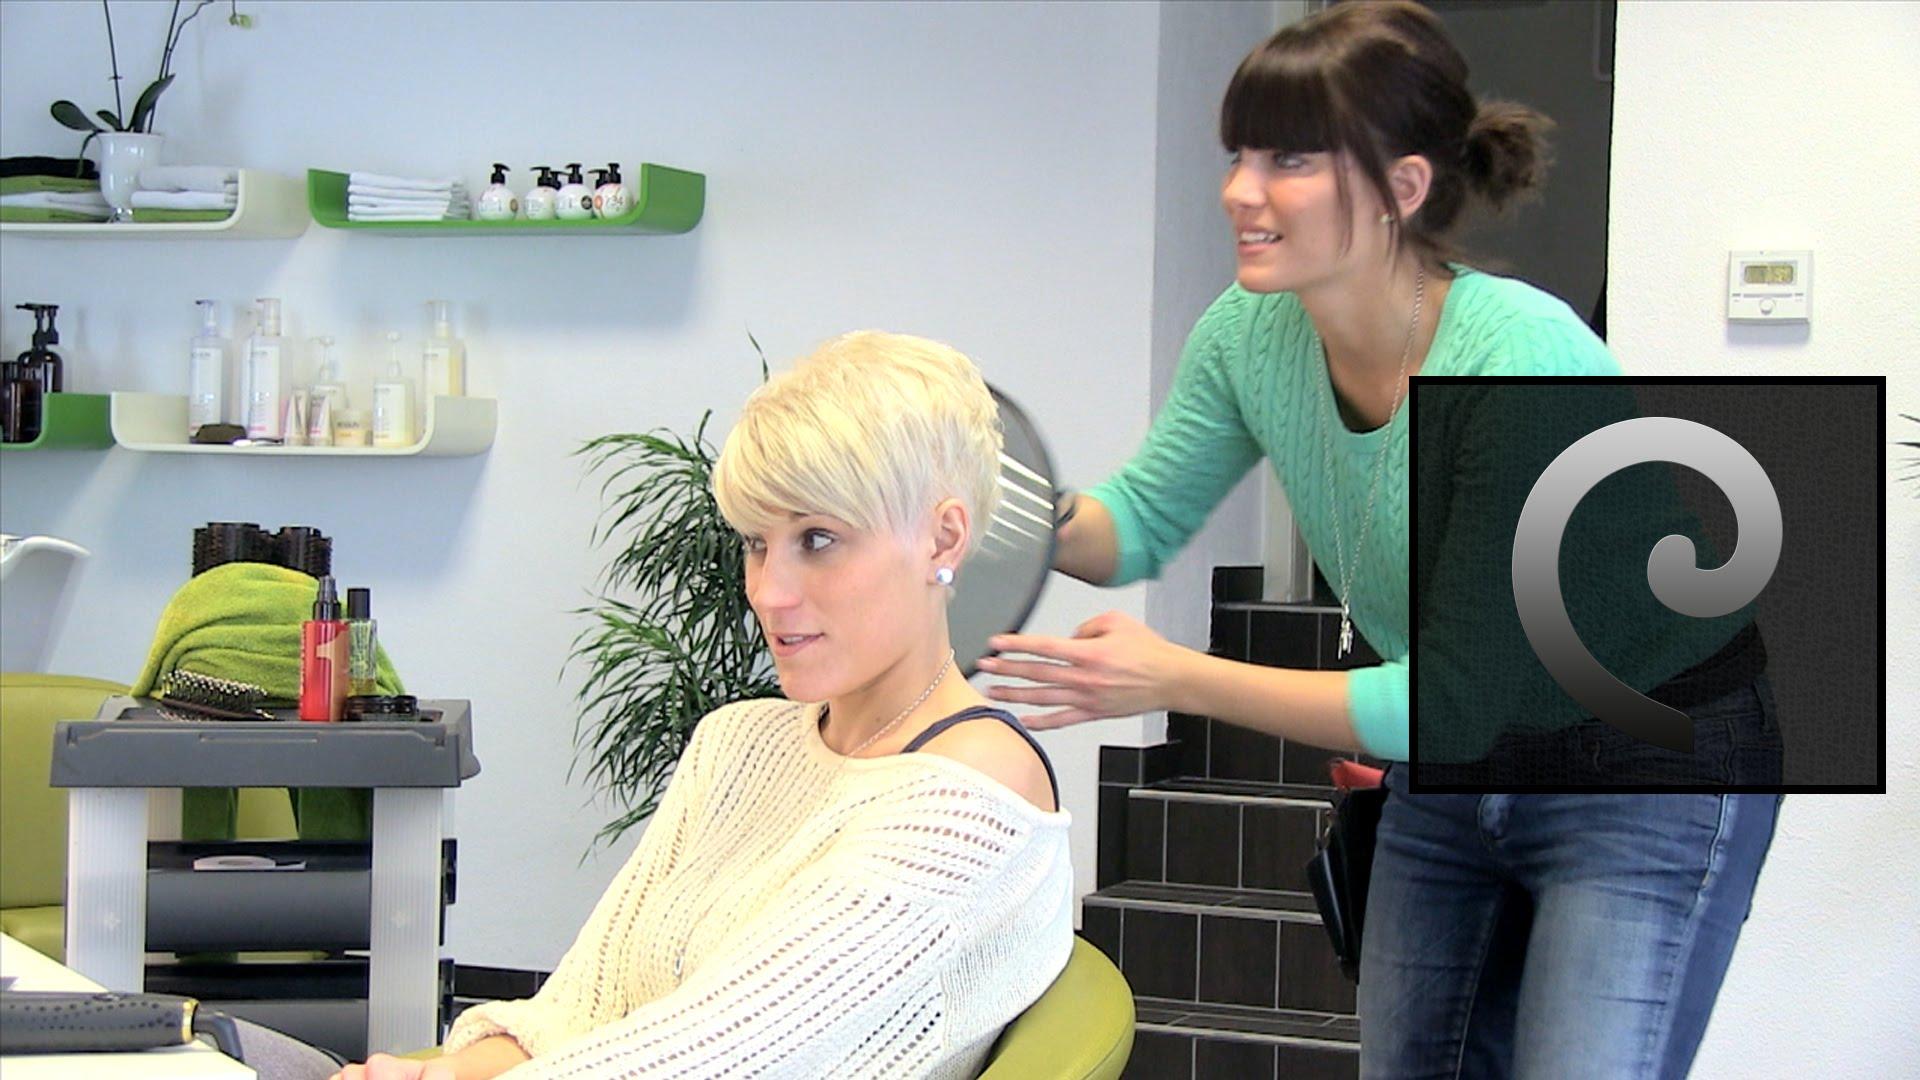 Short Pixie Haircut Makeover Undercut Sidecut Extreme Card